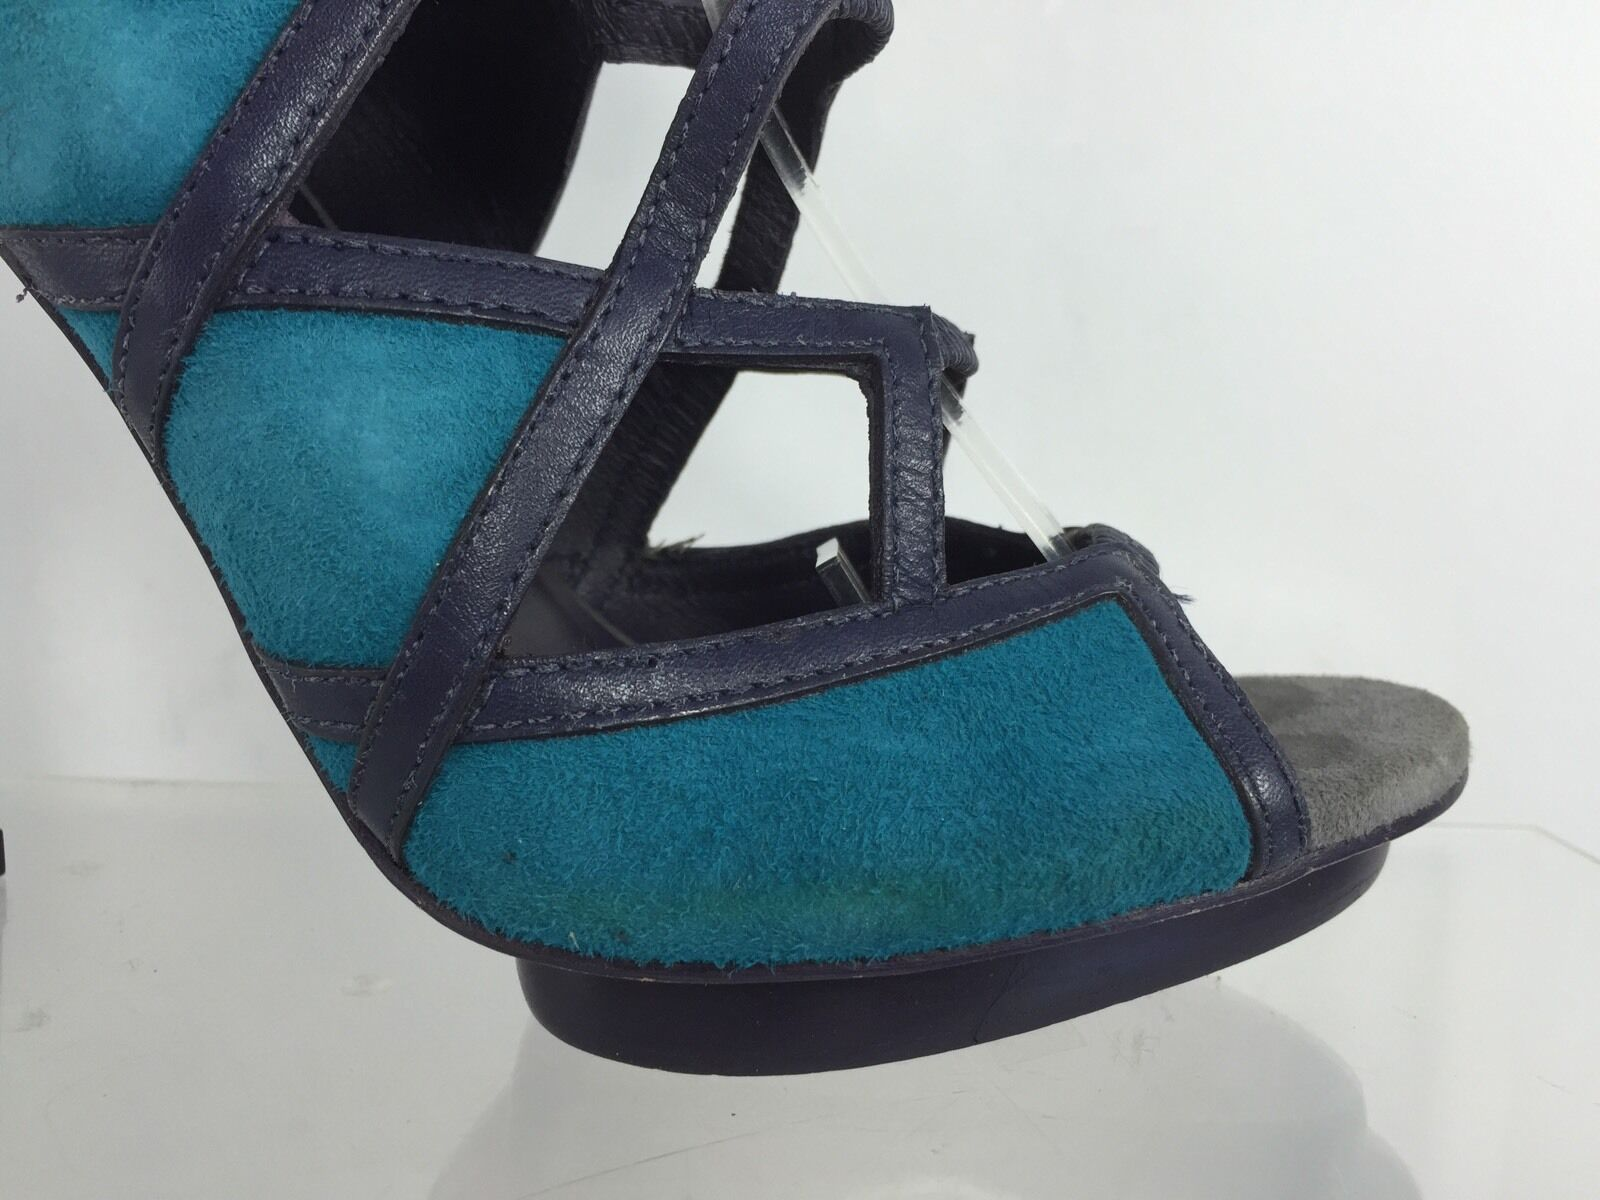 Tory Tory Tory Burch Mujer Zapatos De Tacón Cuero gris Multi Color de 7 M 8e2abe